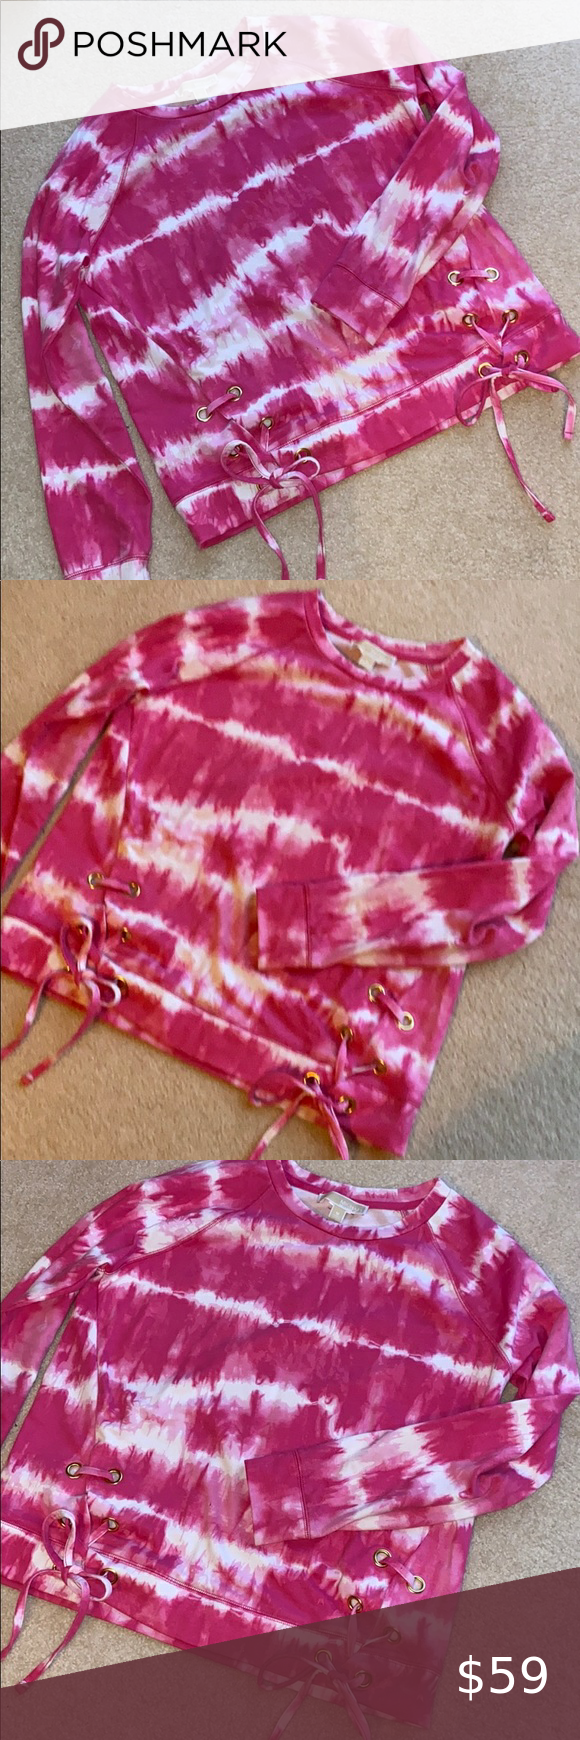 Michael Kors Pink Tie Dye Lace Up Sweatshirt Tie Dye Tie Dye Sweatshirt Pink Tie Dye [ 1740 x 580 Pixel ]